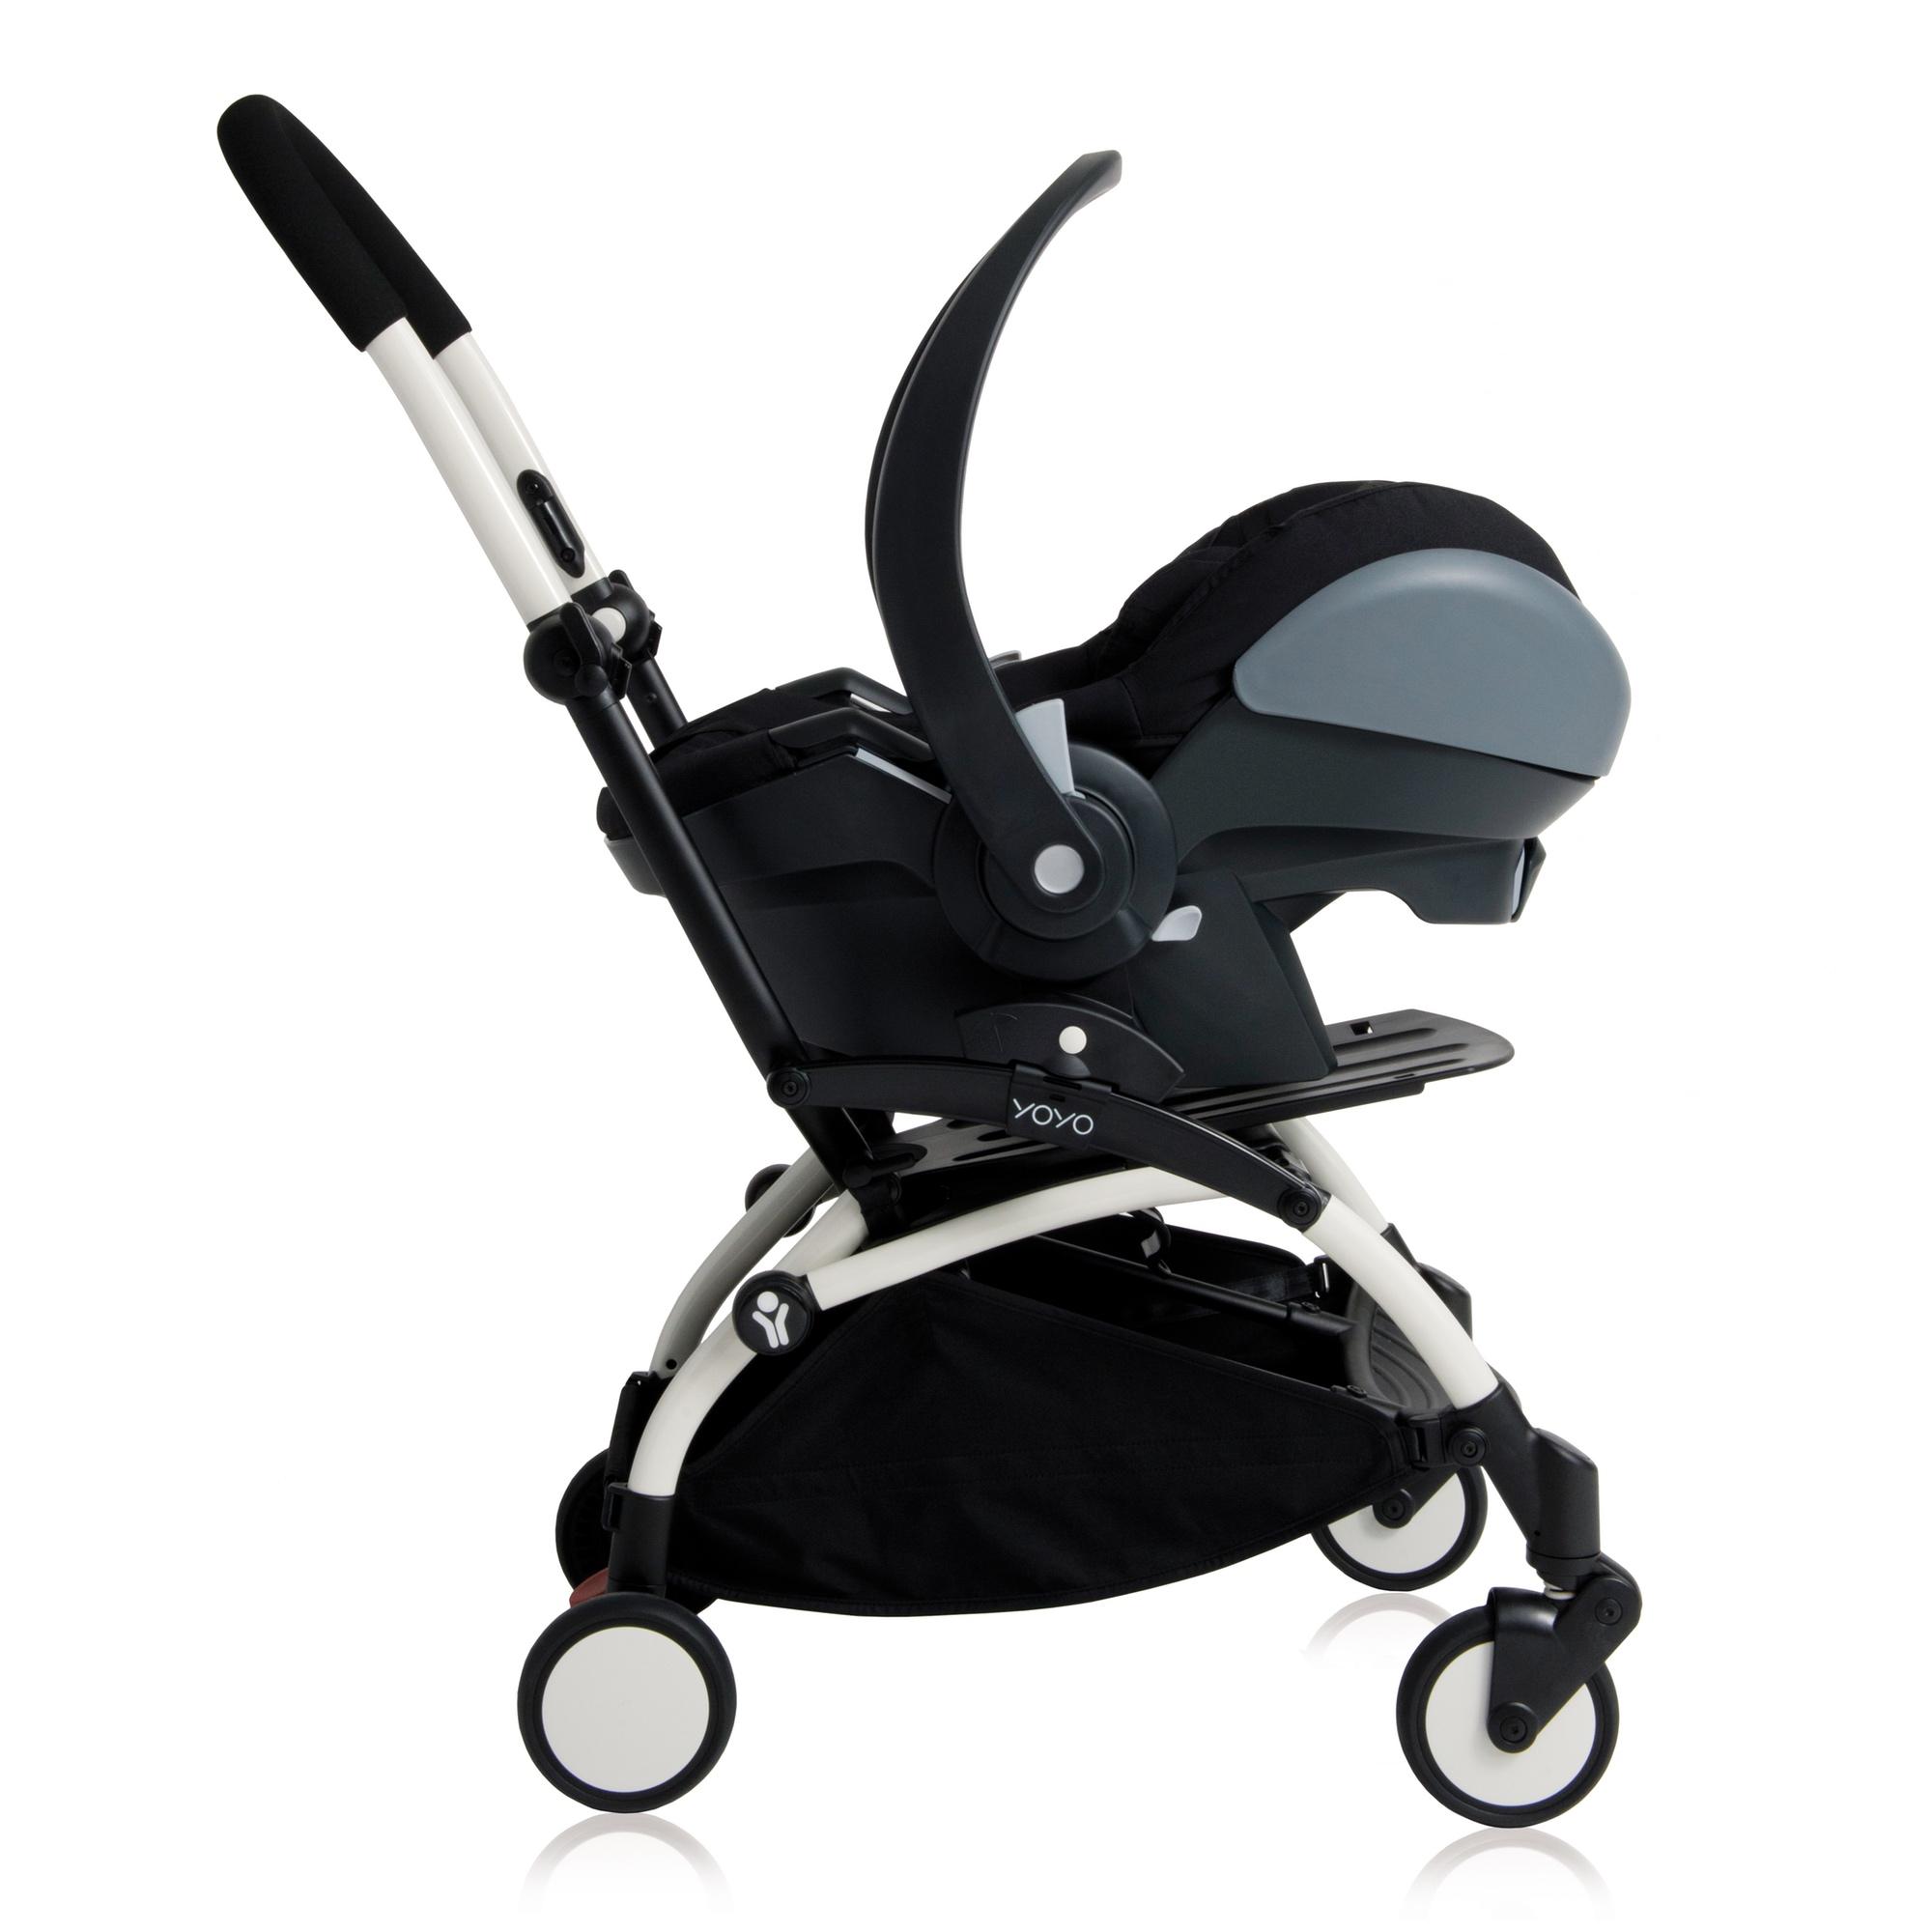 babyzen yoyo autositz adapter die zwergperten babyschalen reboarder kindersitze. Black Bedroom Furniture Sets. Home Design Ideas